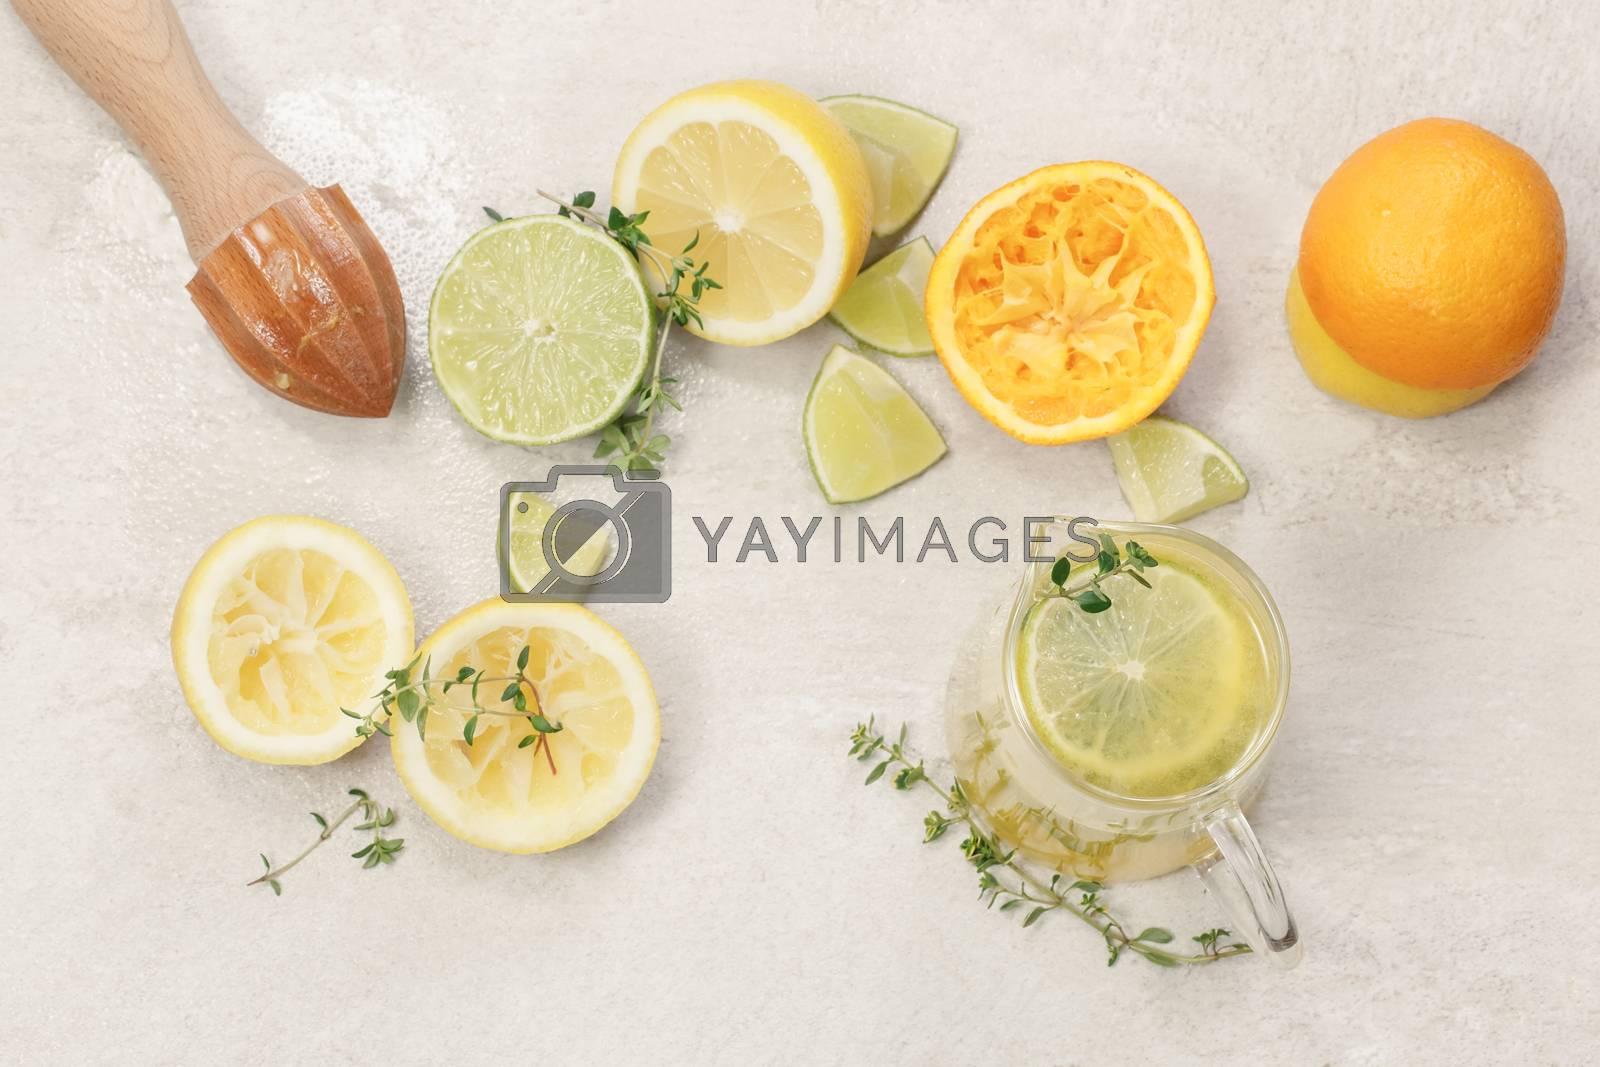 Preparing homemade lemonade by Slast20